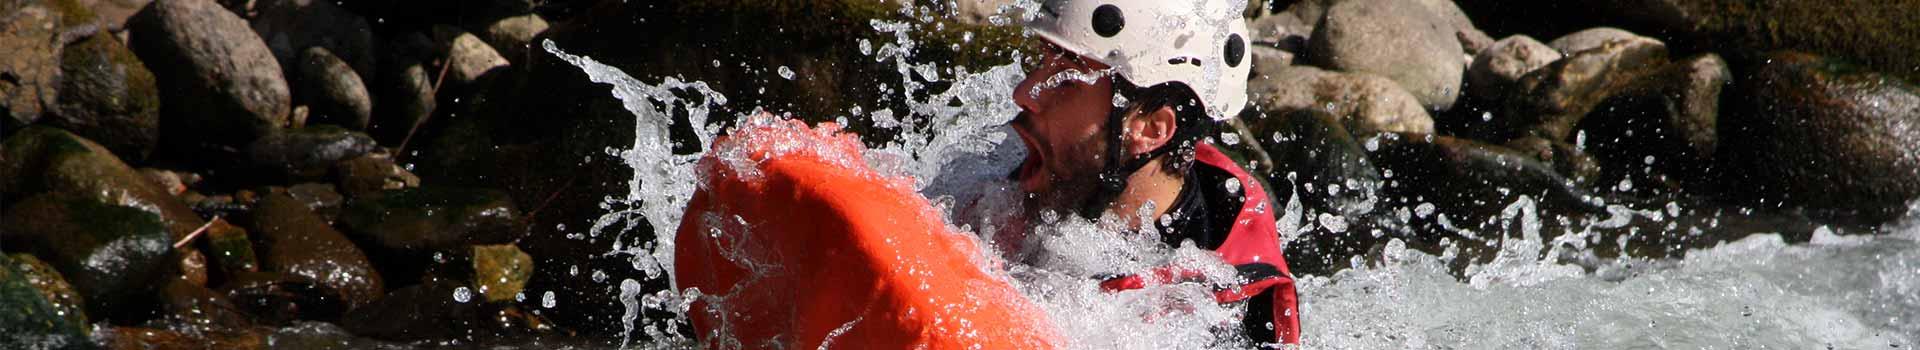 Hydrospeed Trentino